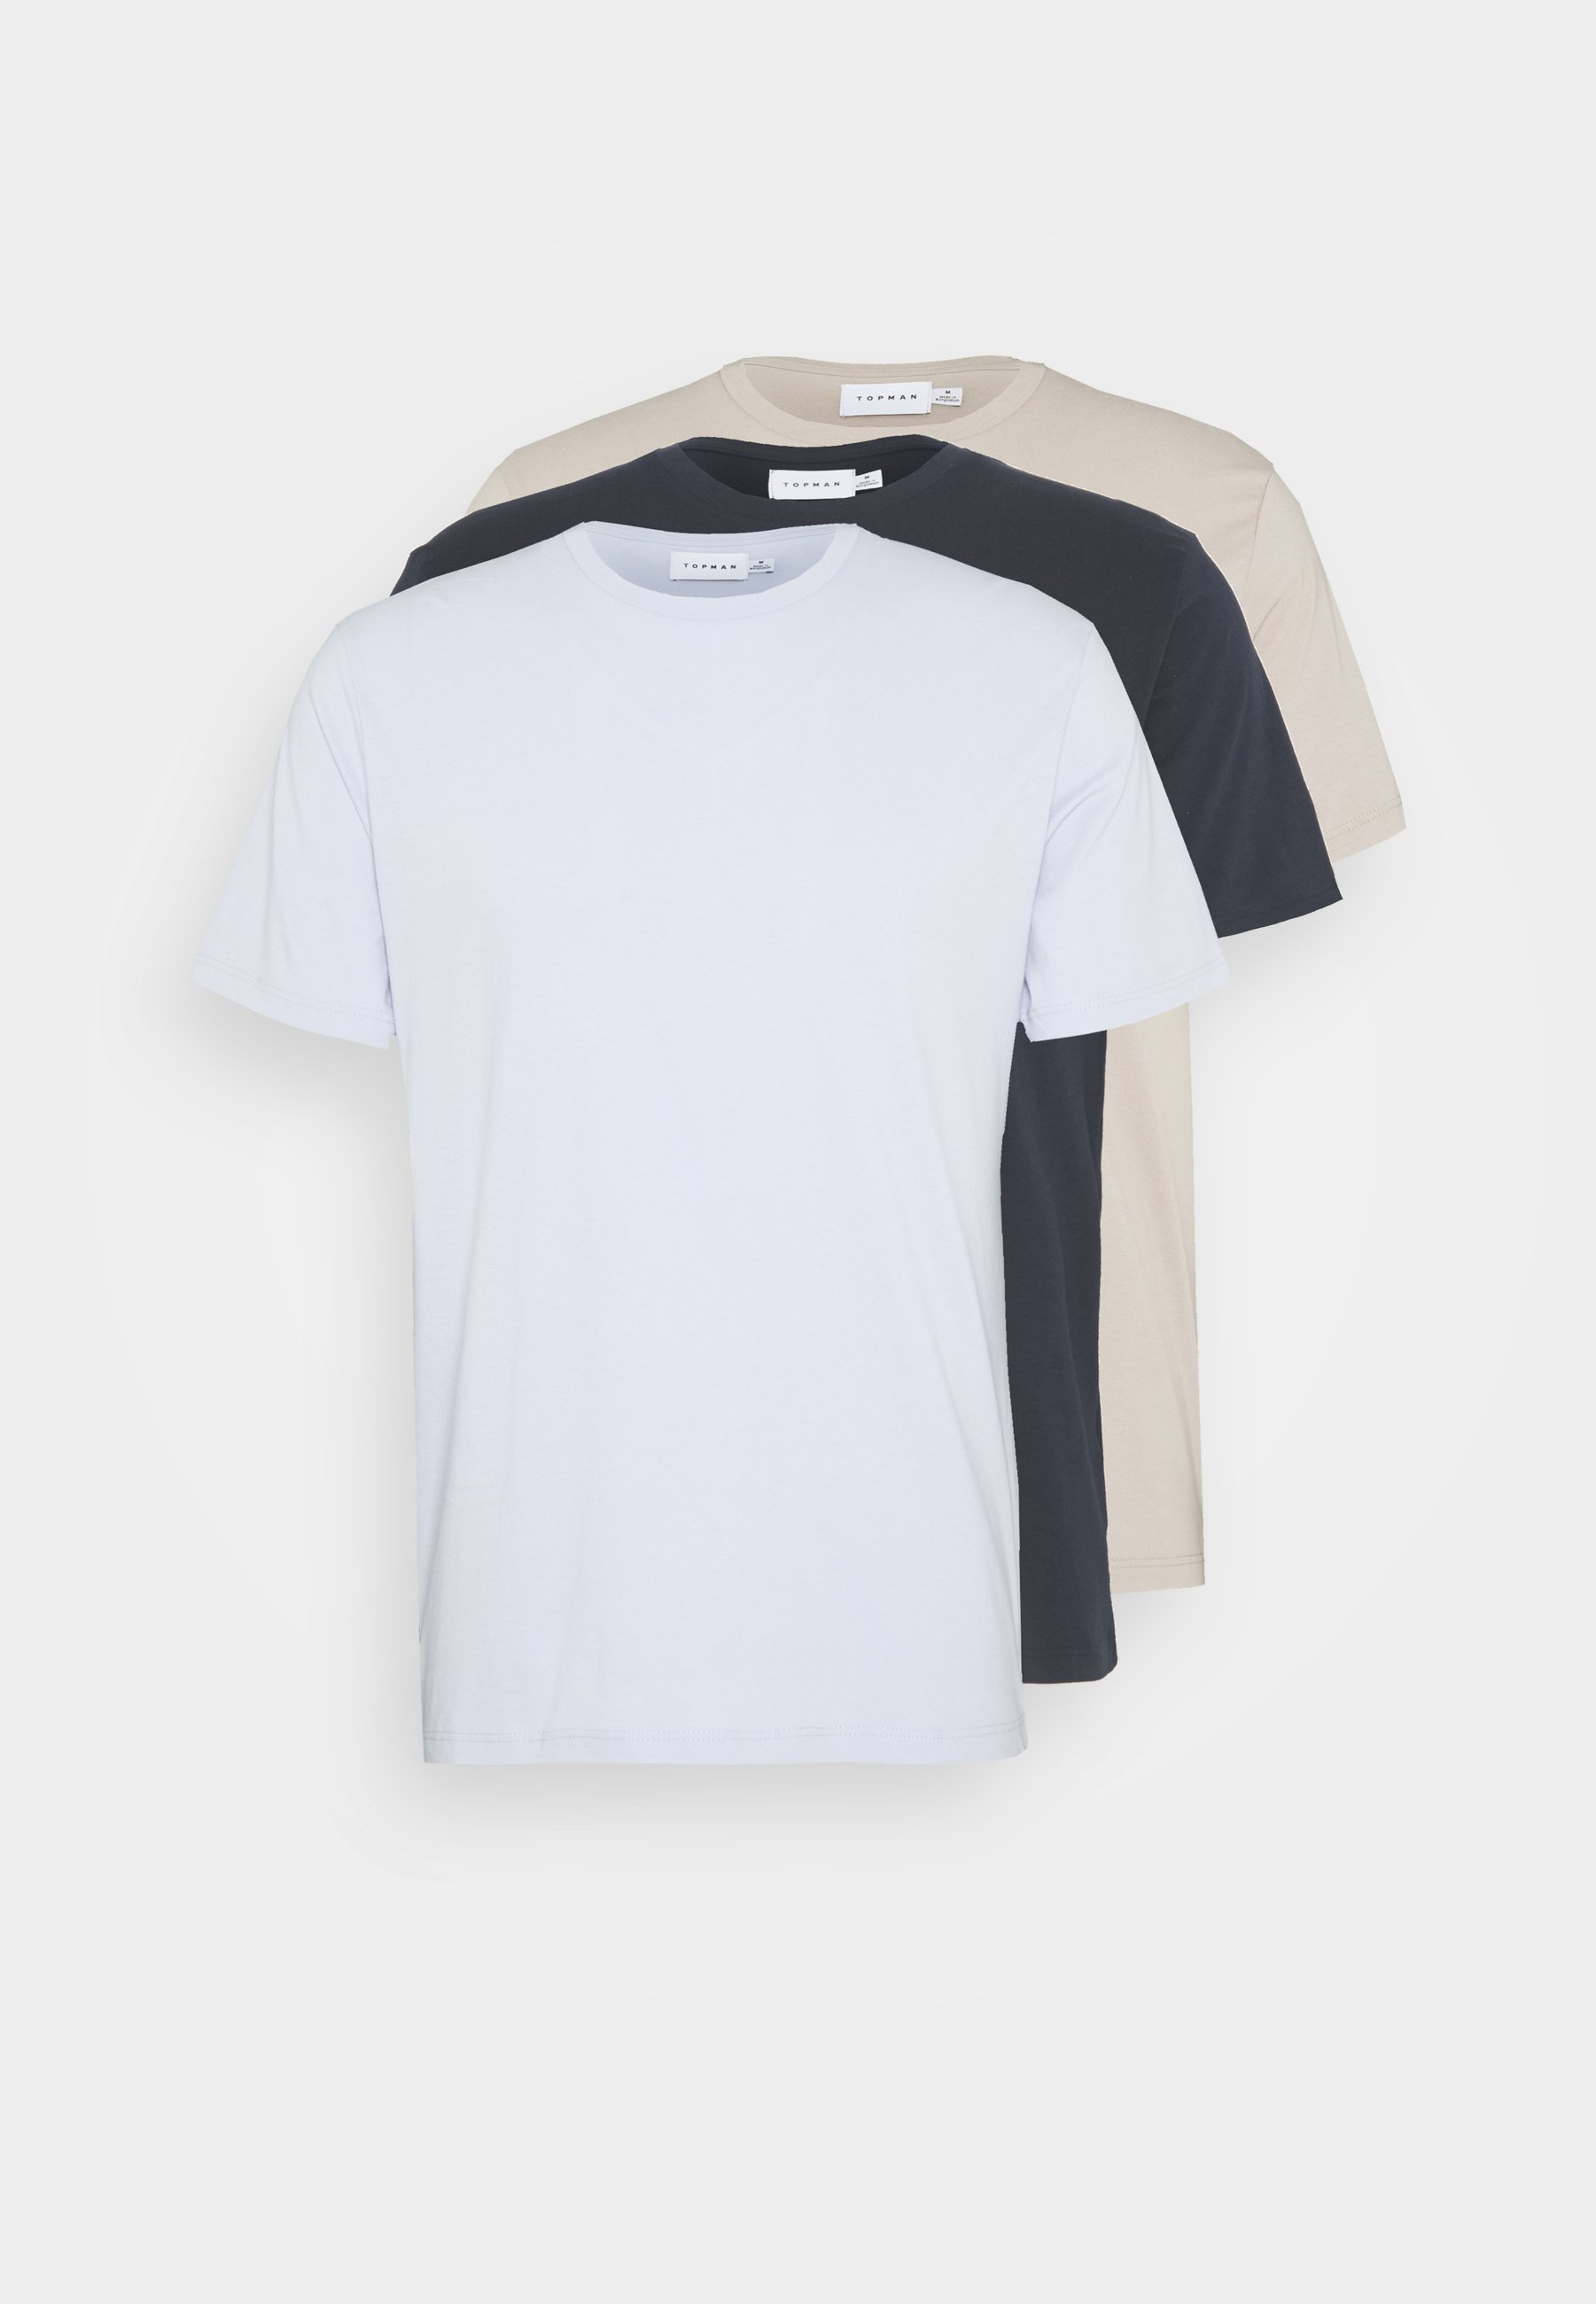 Topman 3 PACK - T-shirts - dark blue/stone/blue